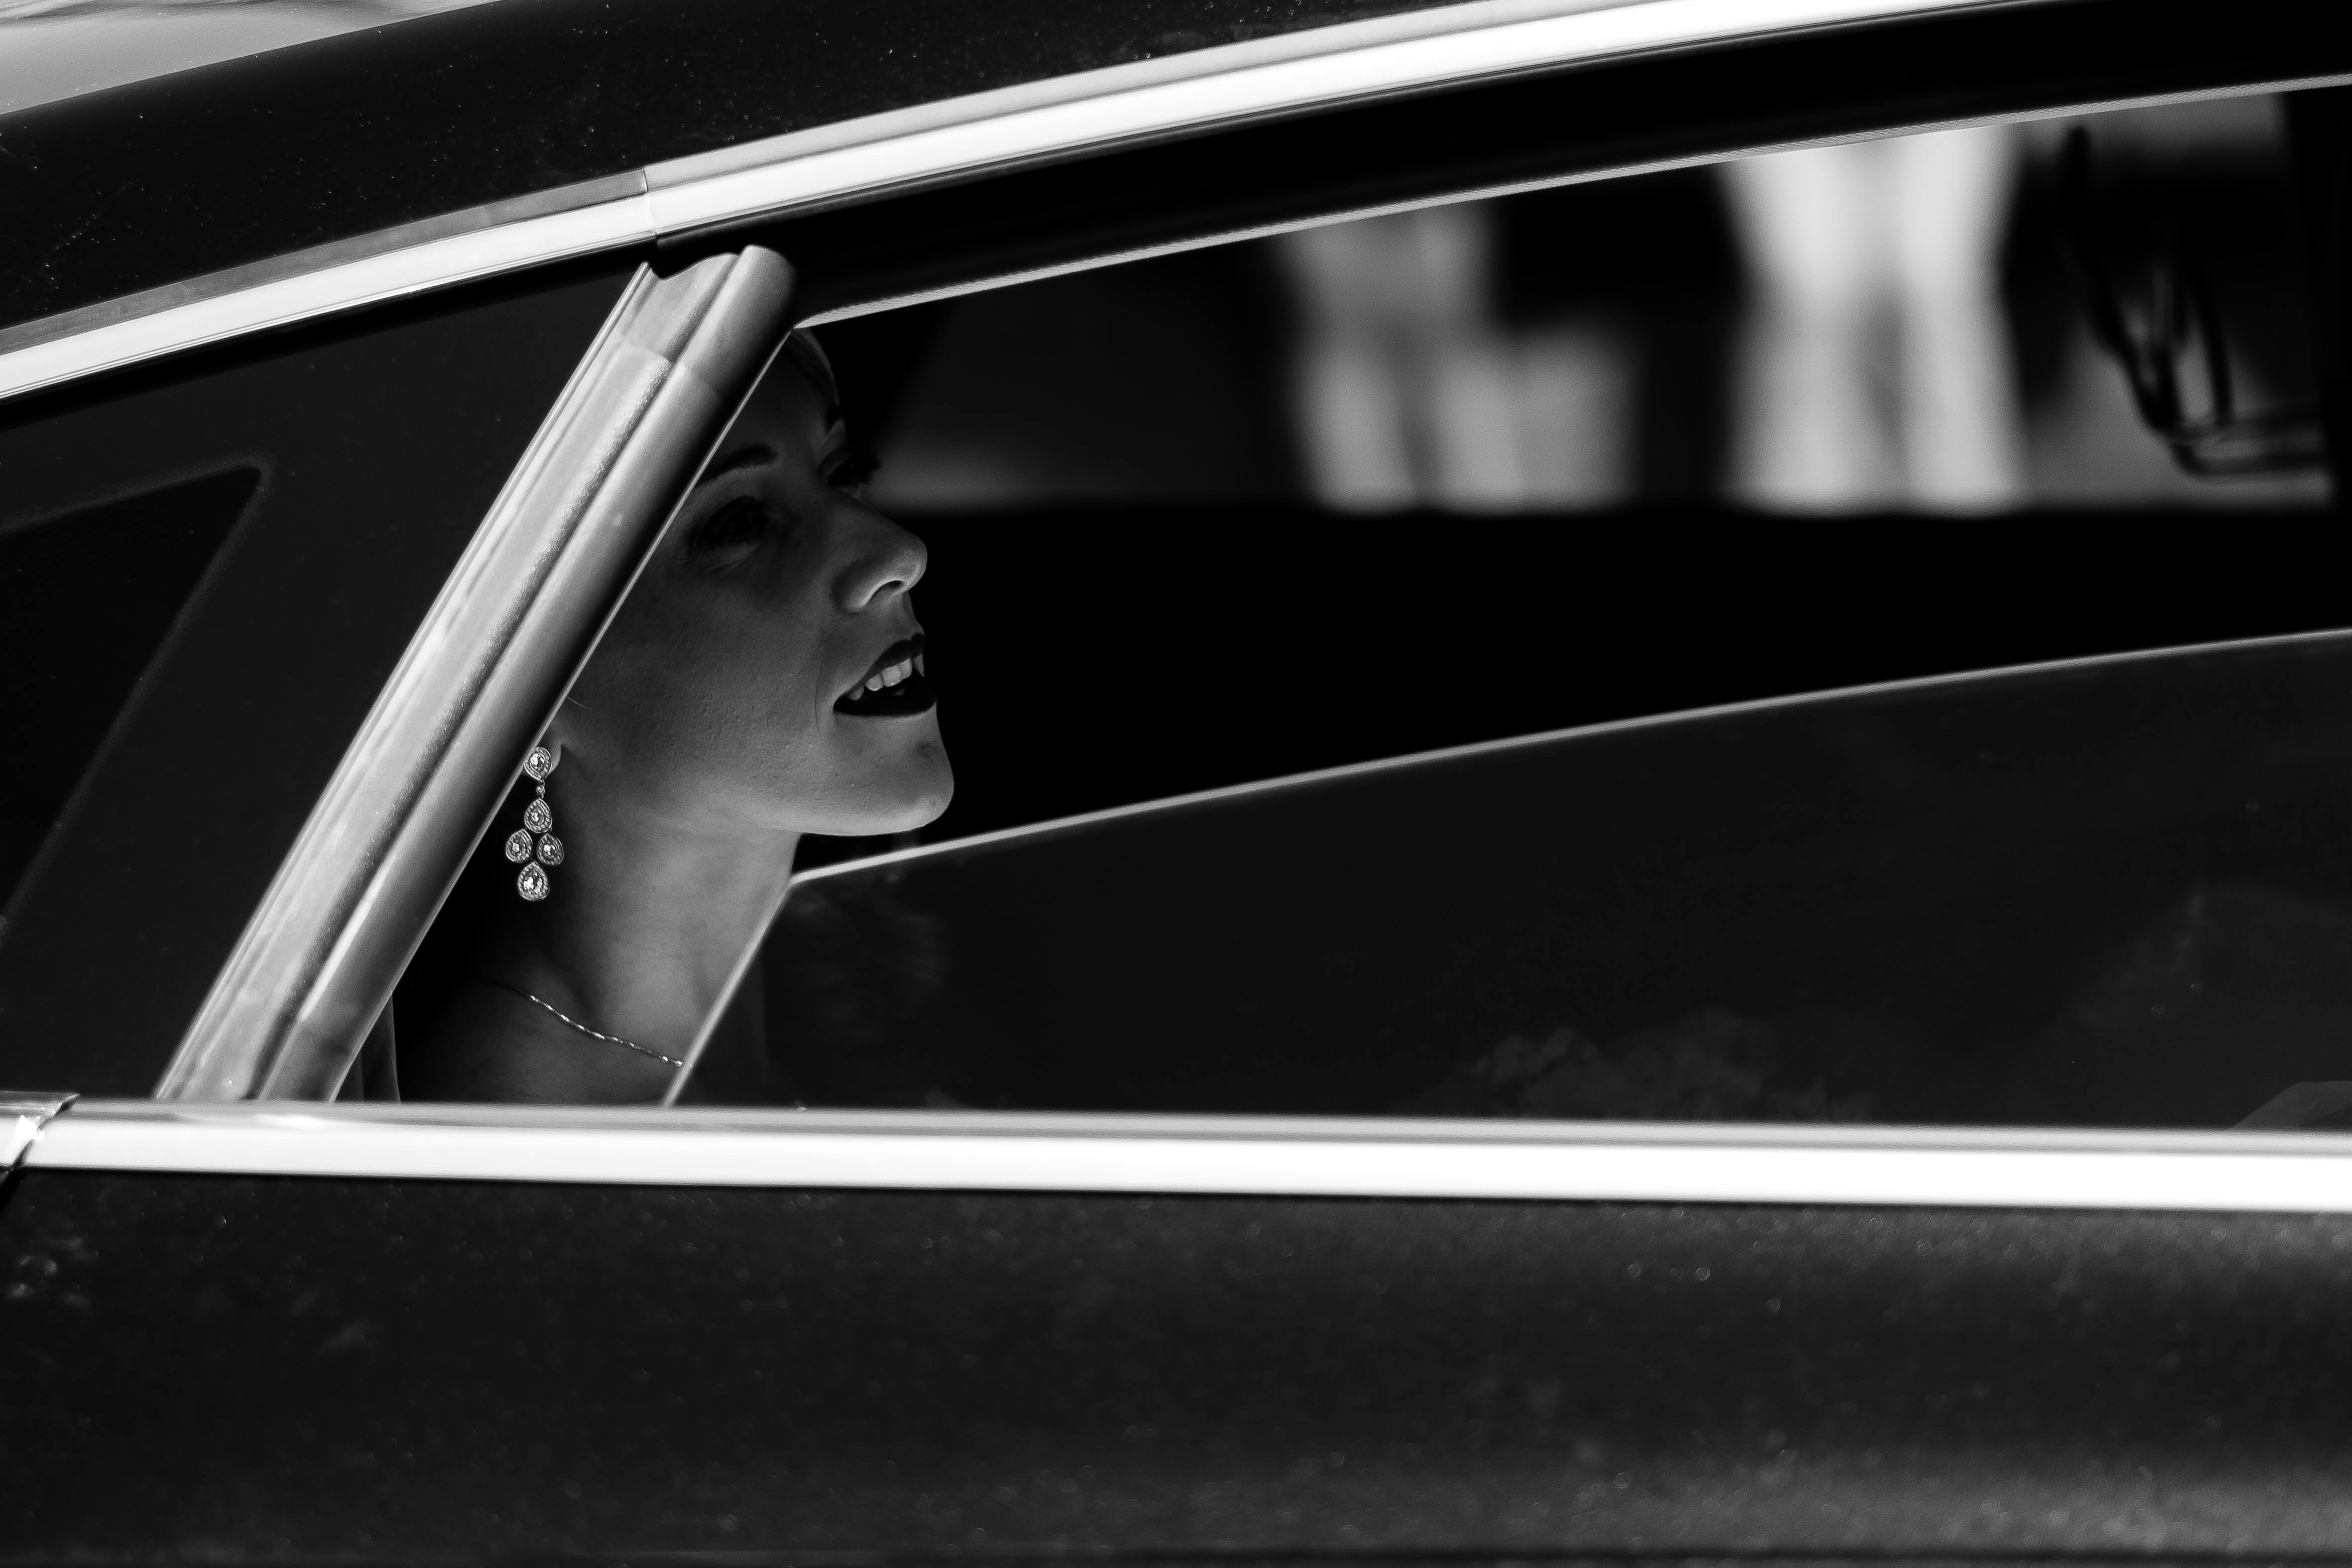 1_Mariee voiture noir et blanc